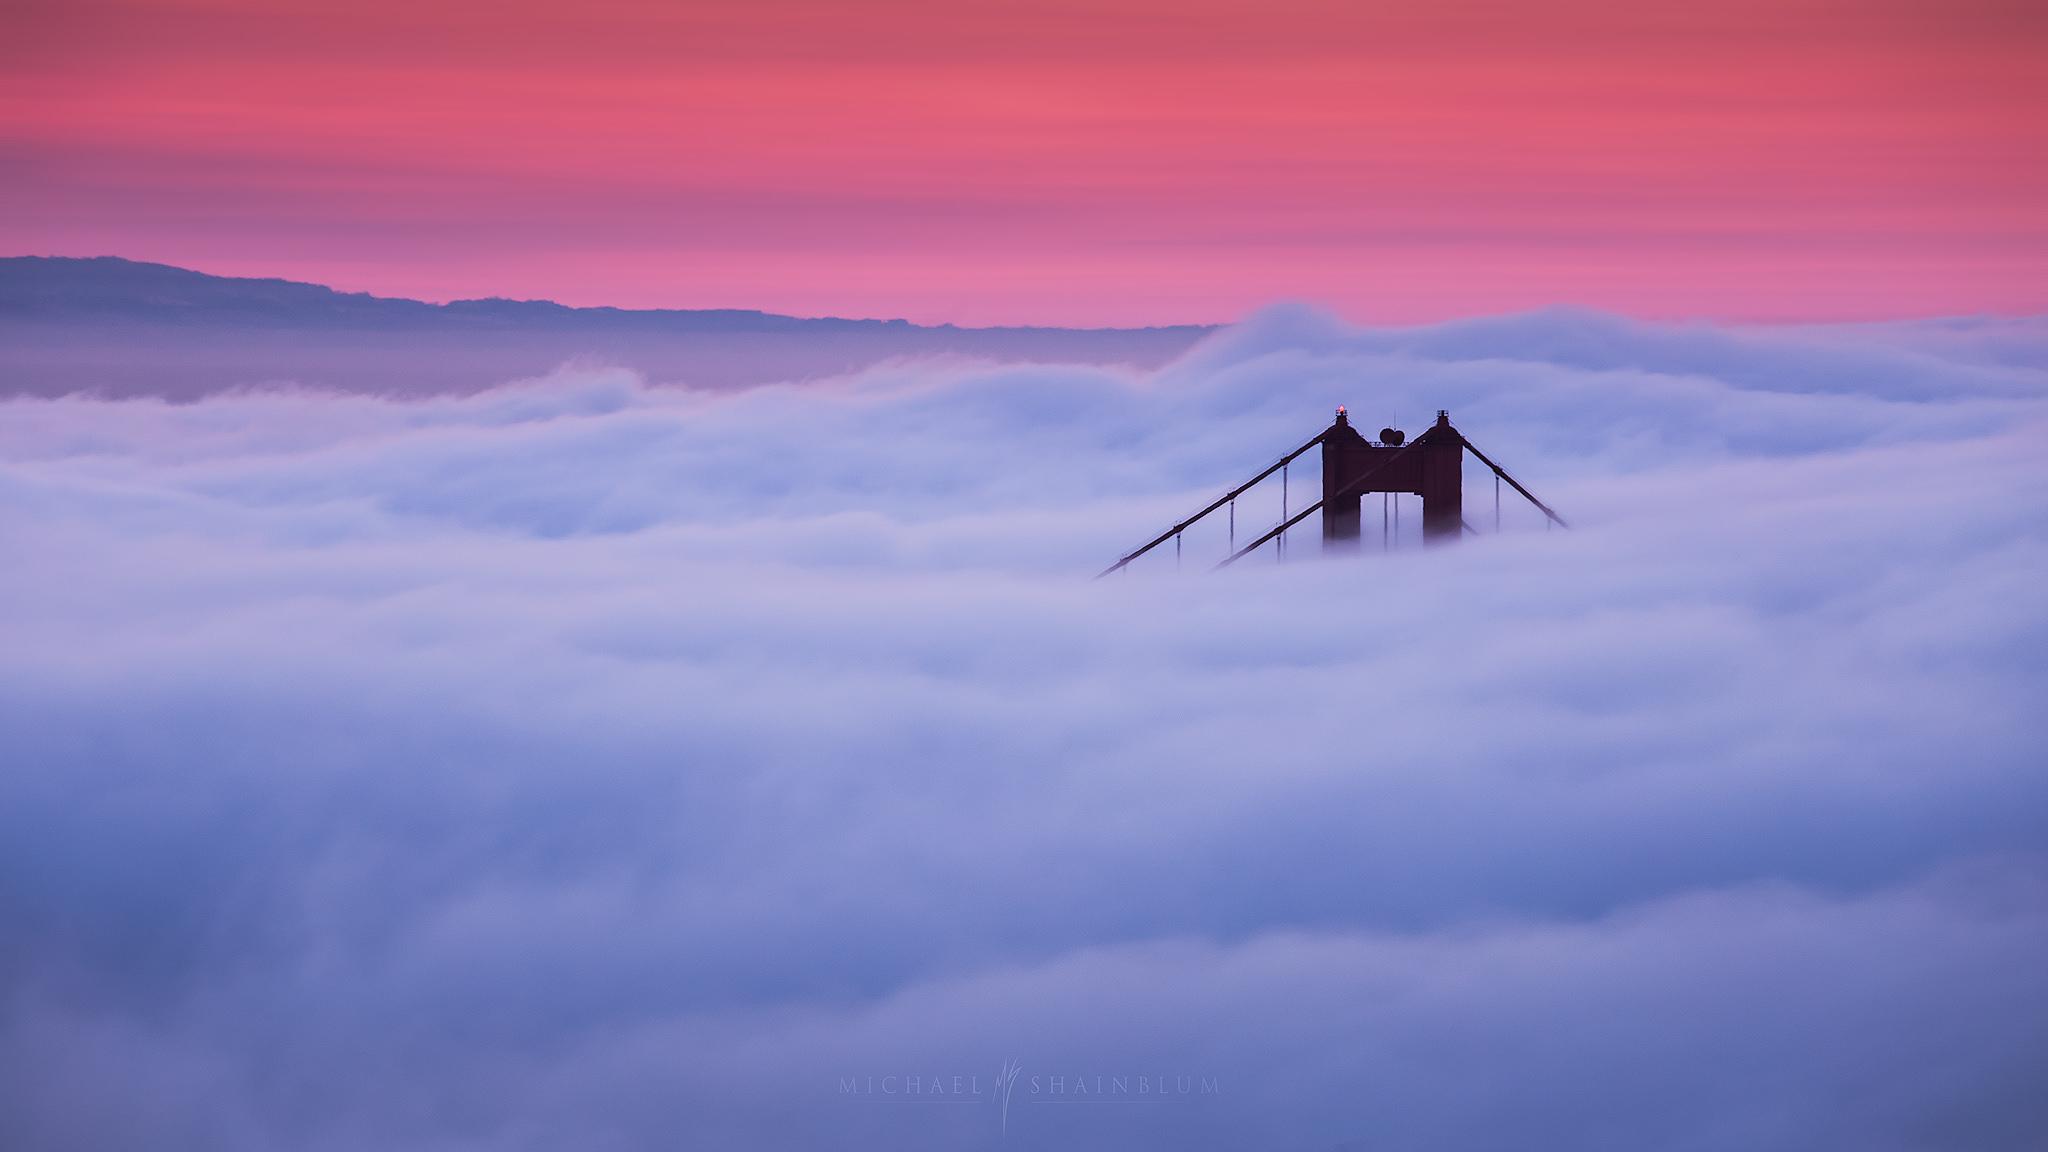 Golden Gate Bridge Photography, San Francisco Timelapse